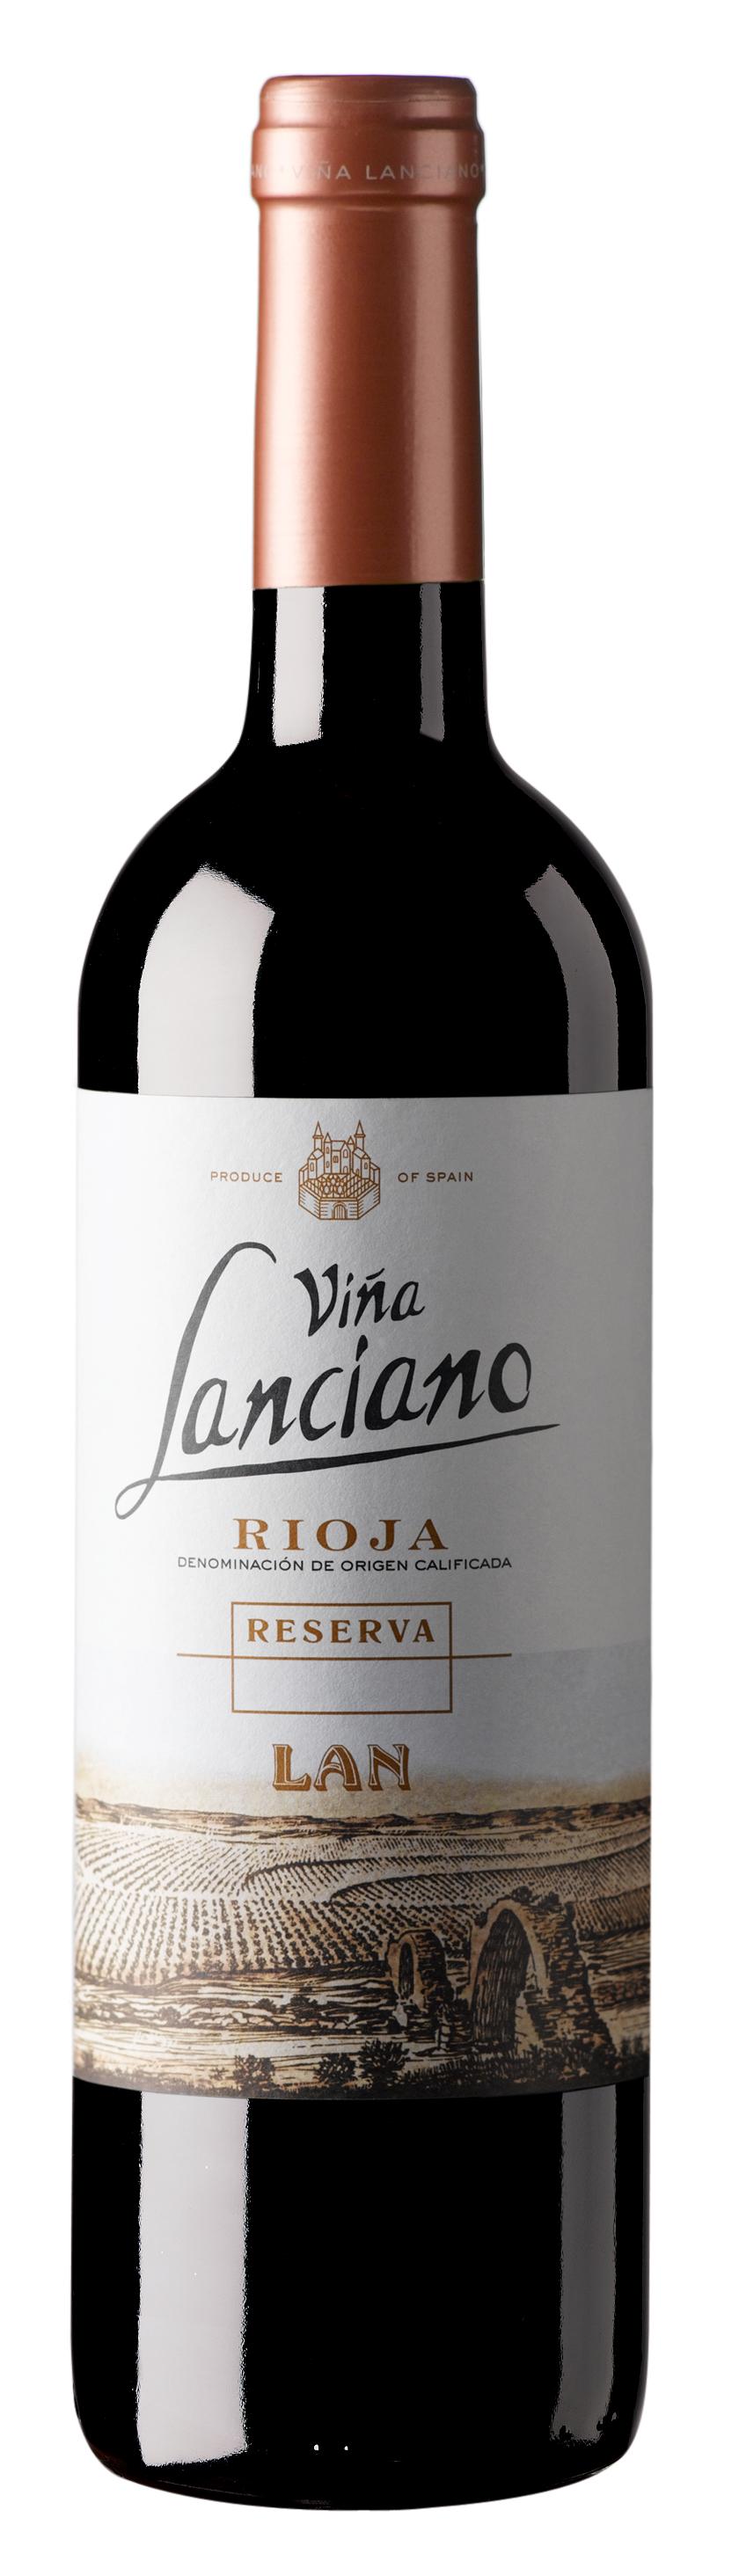 2 Viña Lanciano Reserva.jpg